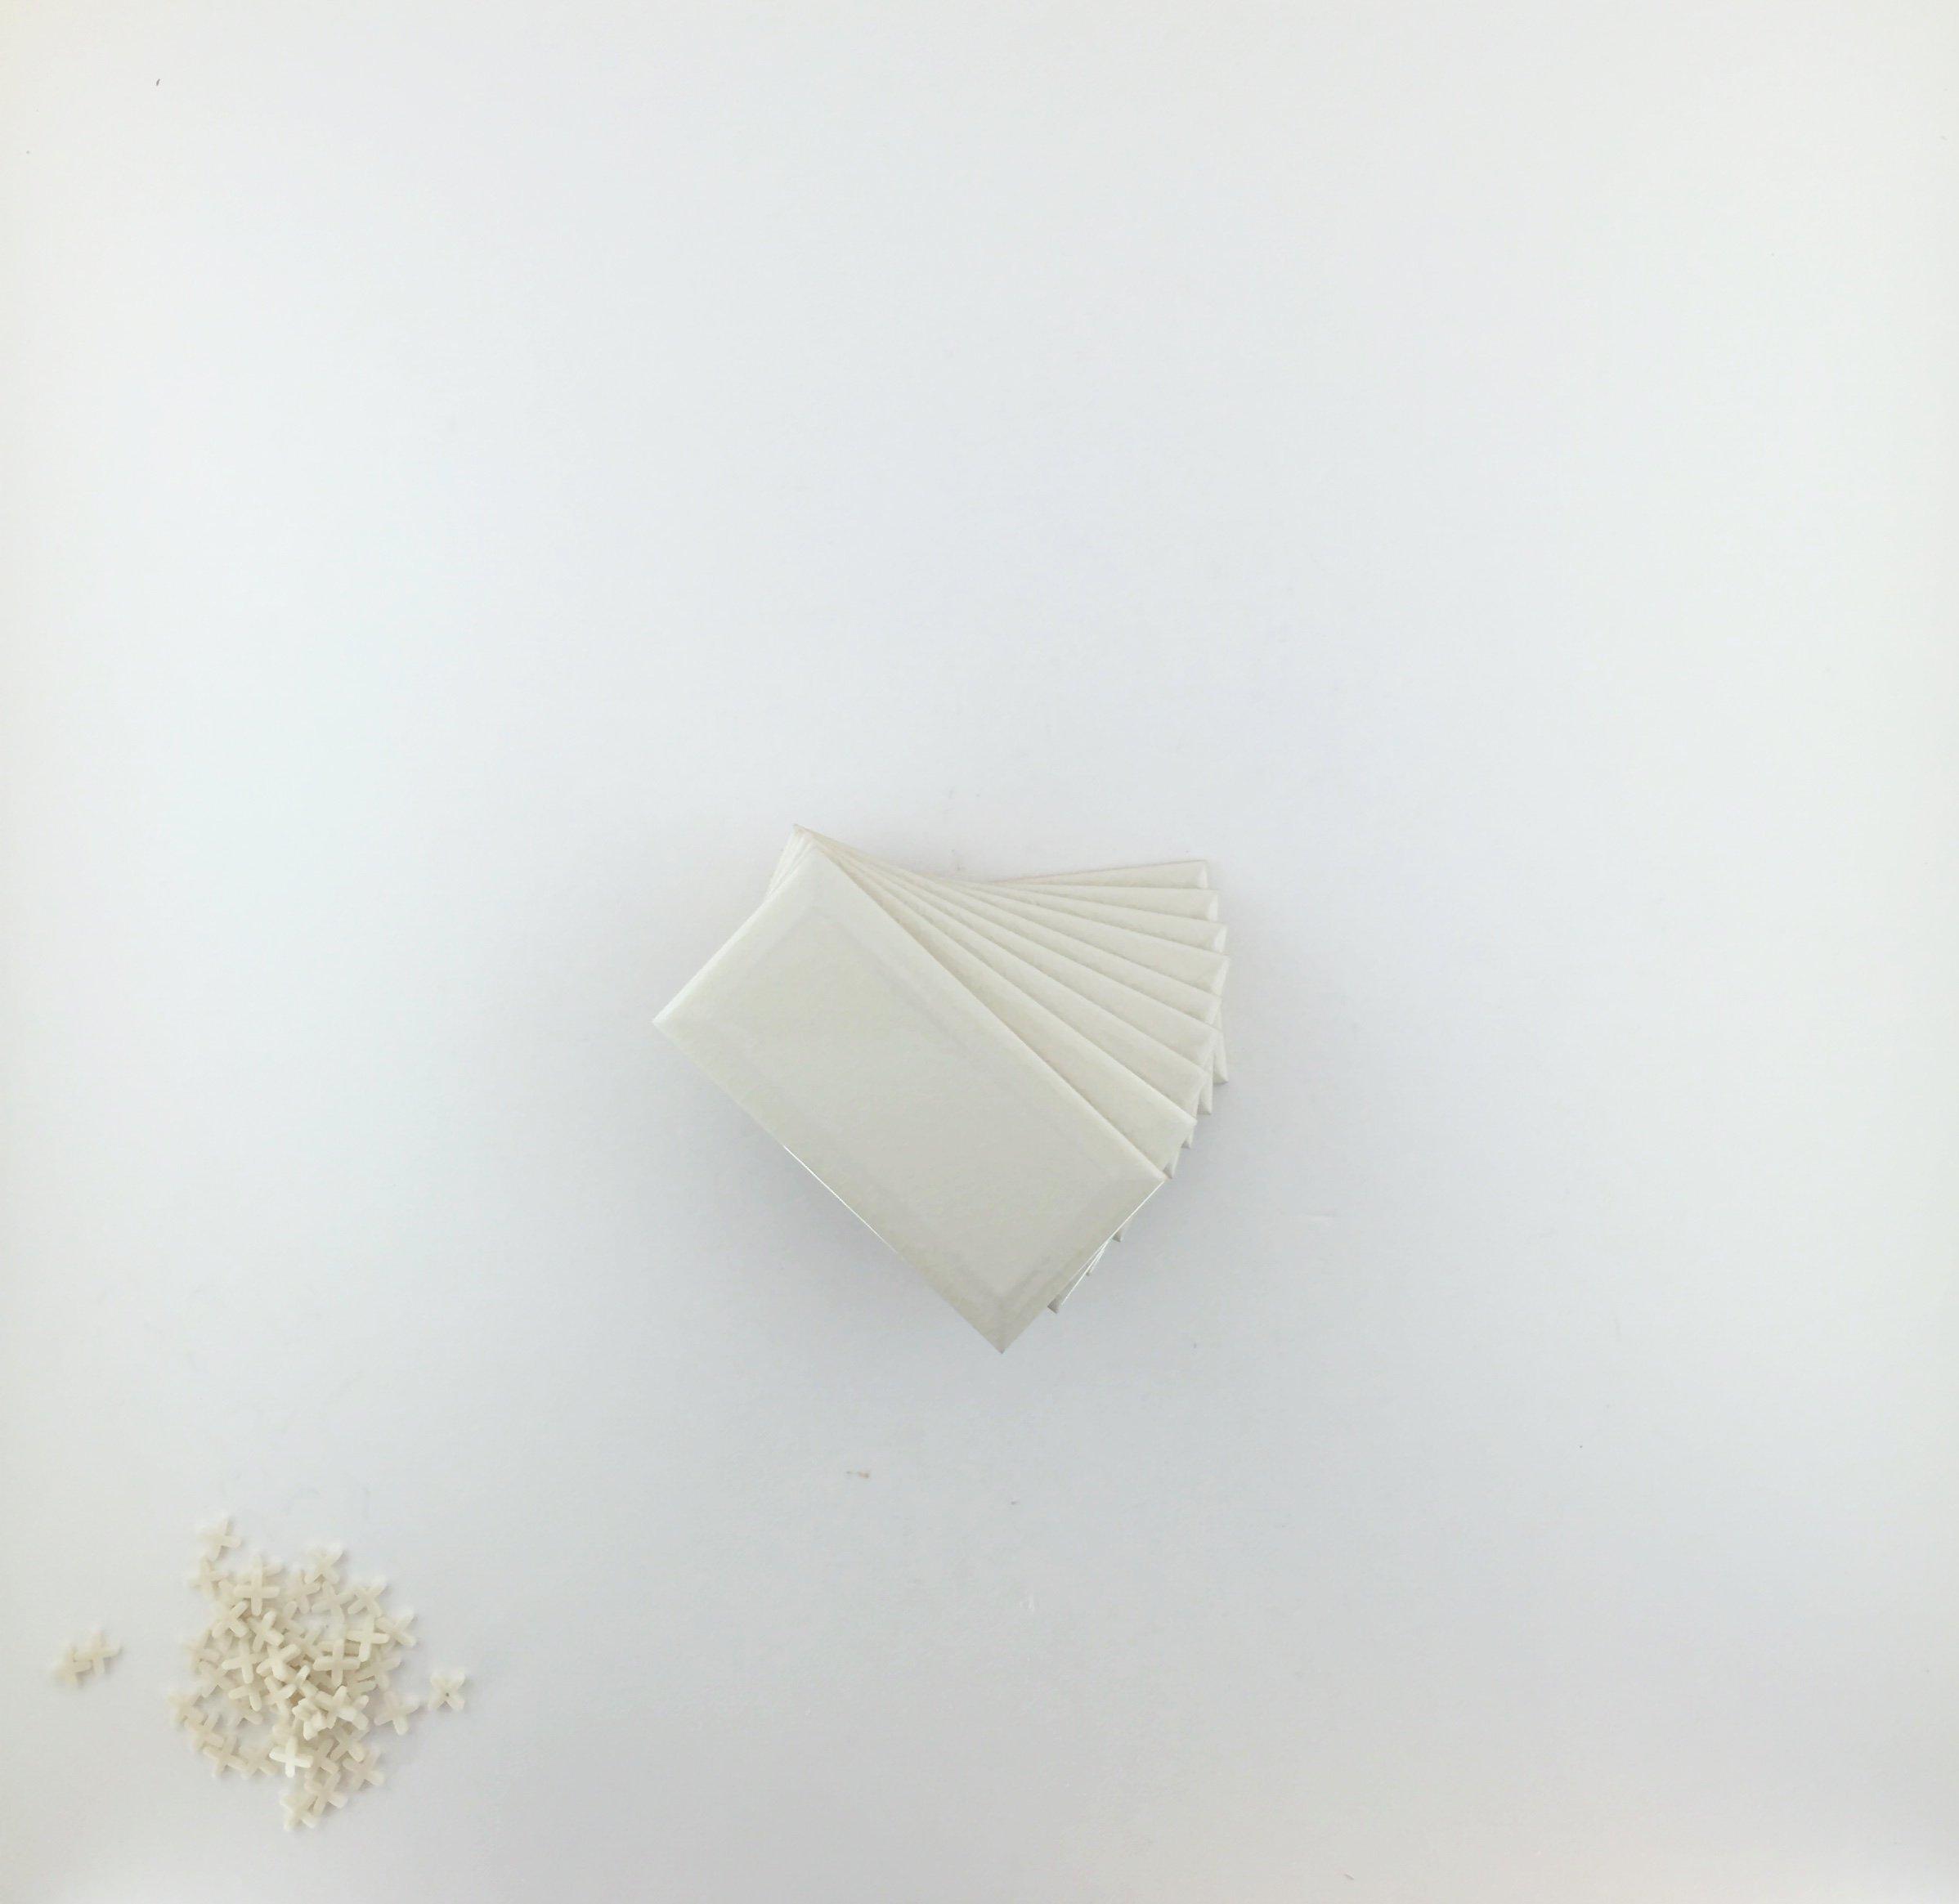 Bone Bevelled Crackle 3x6 Subway Tile Backsplash, Kitchen, Walls, Countertop, Bathroom, Herringbone (Lot of 10sq ft)